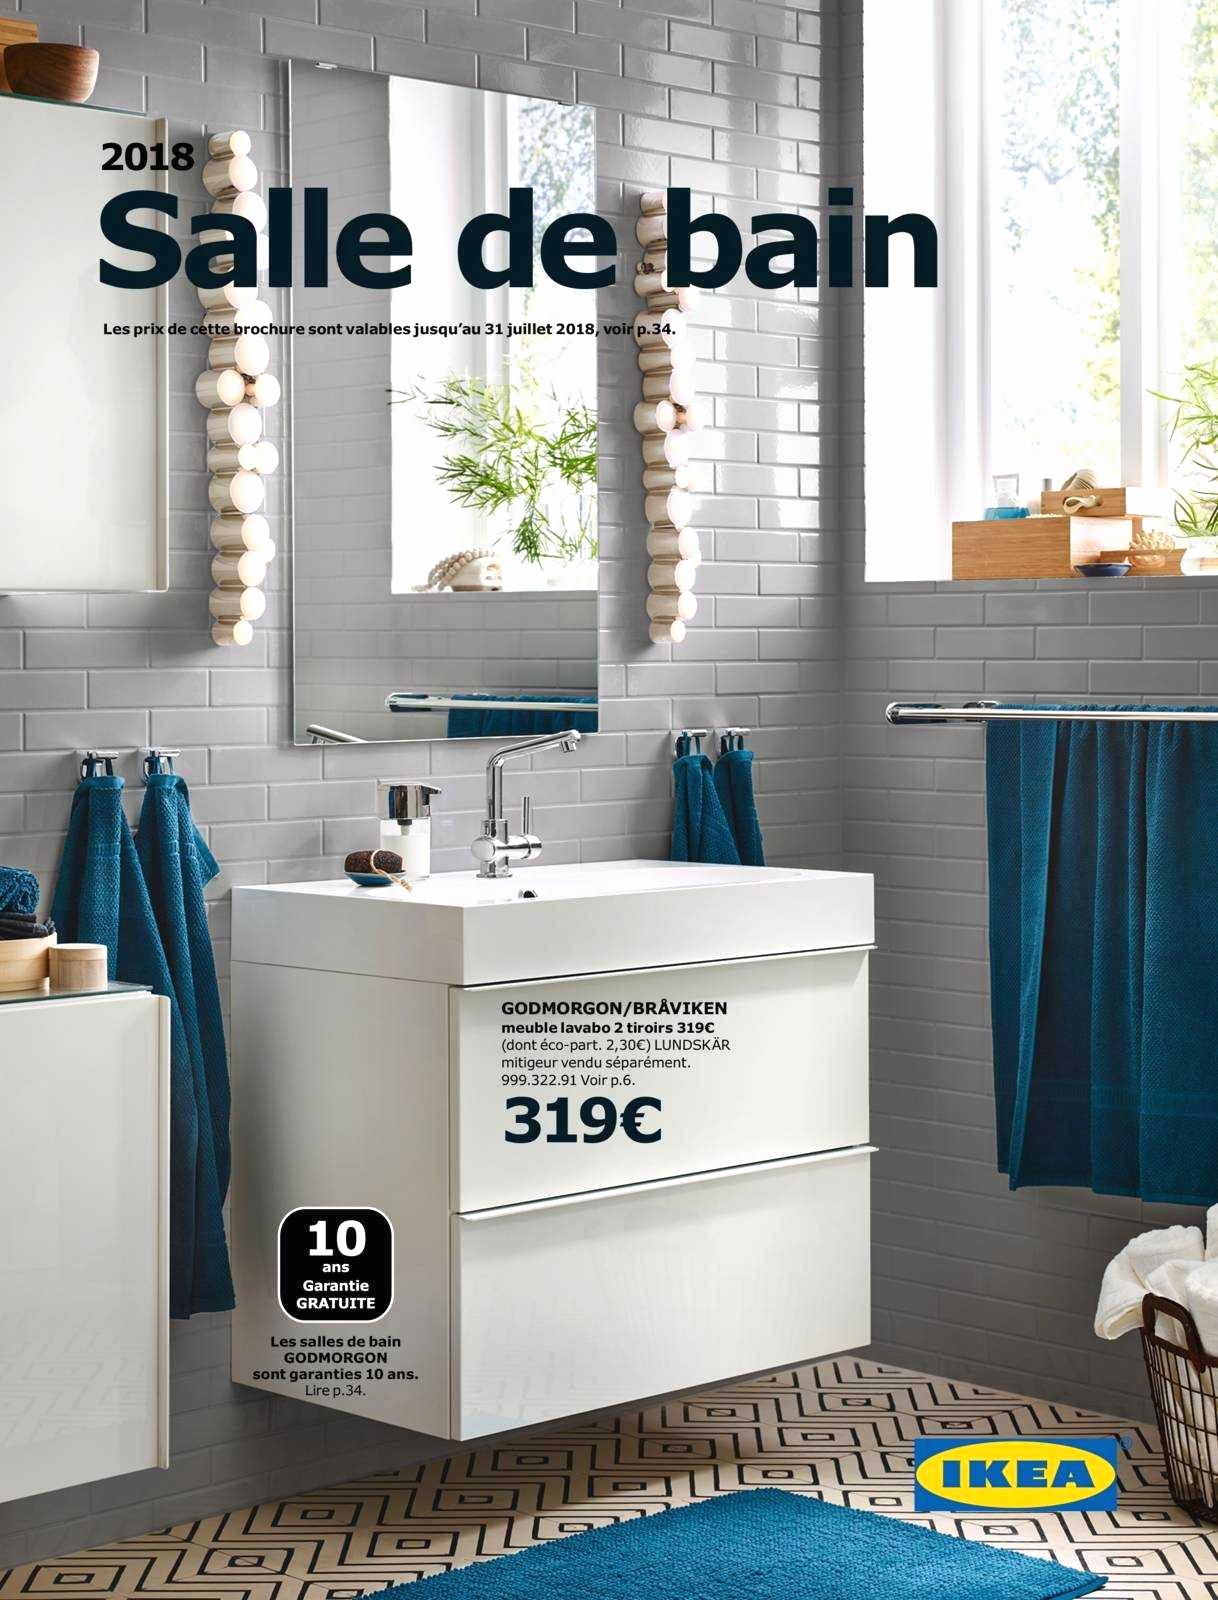 Robinet Castorama Salle De Bain Beau Image 53 Beau Graphie De Casto 3d Salle De Bain